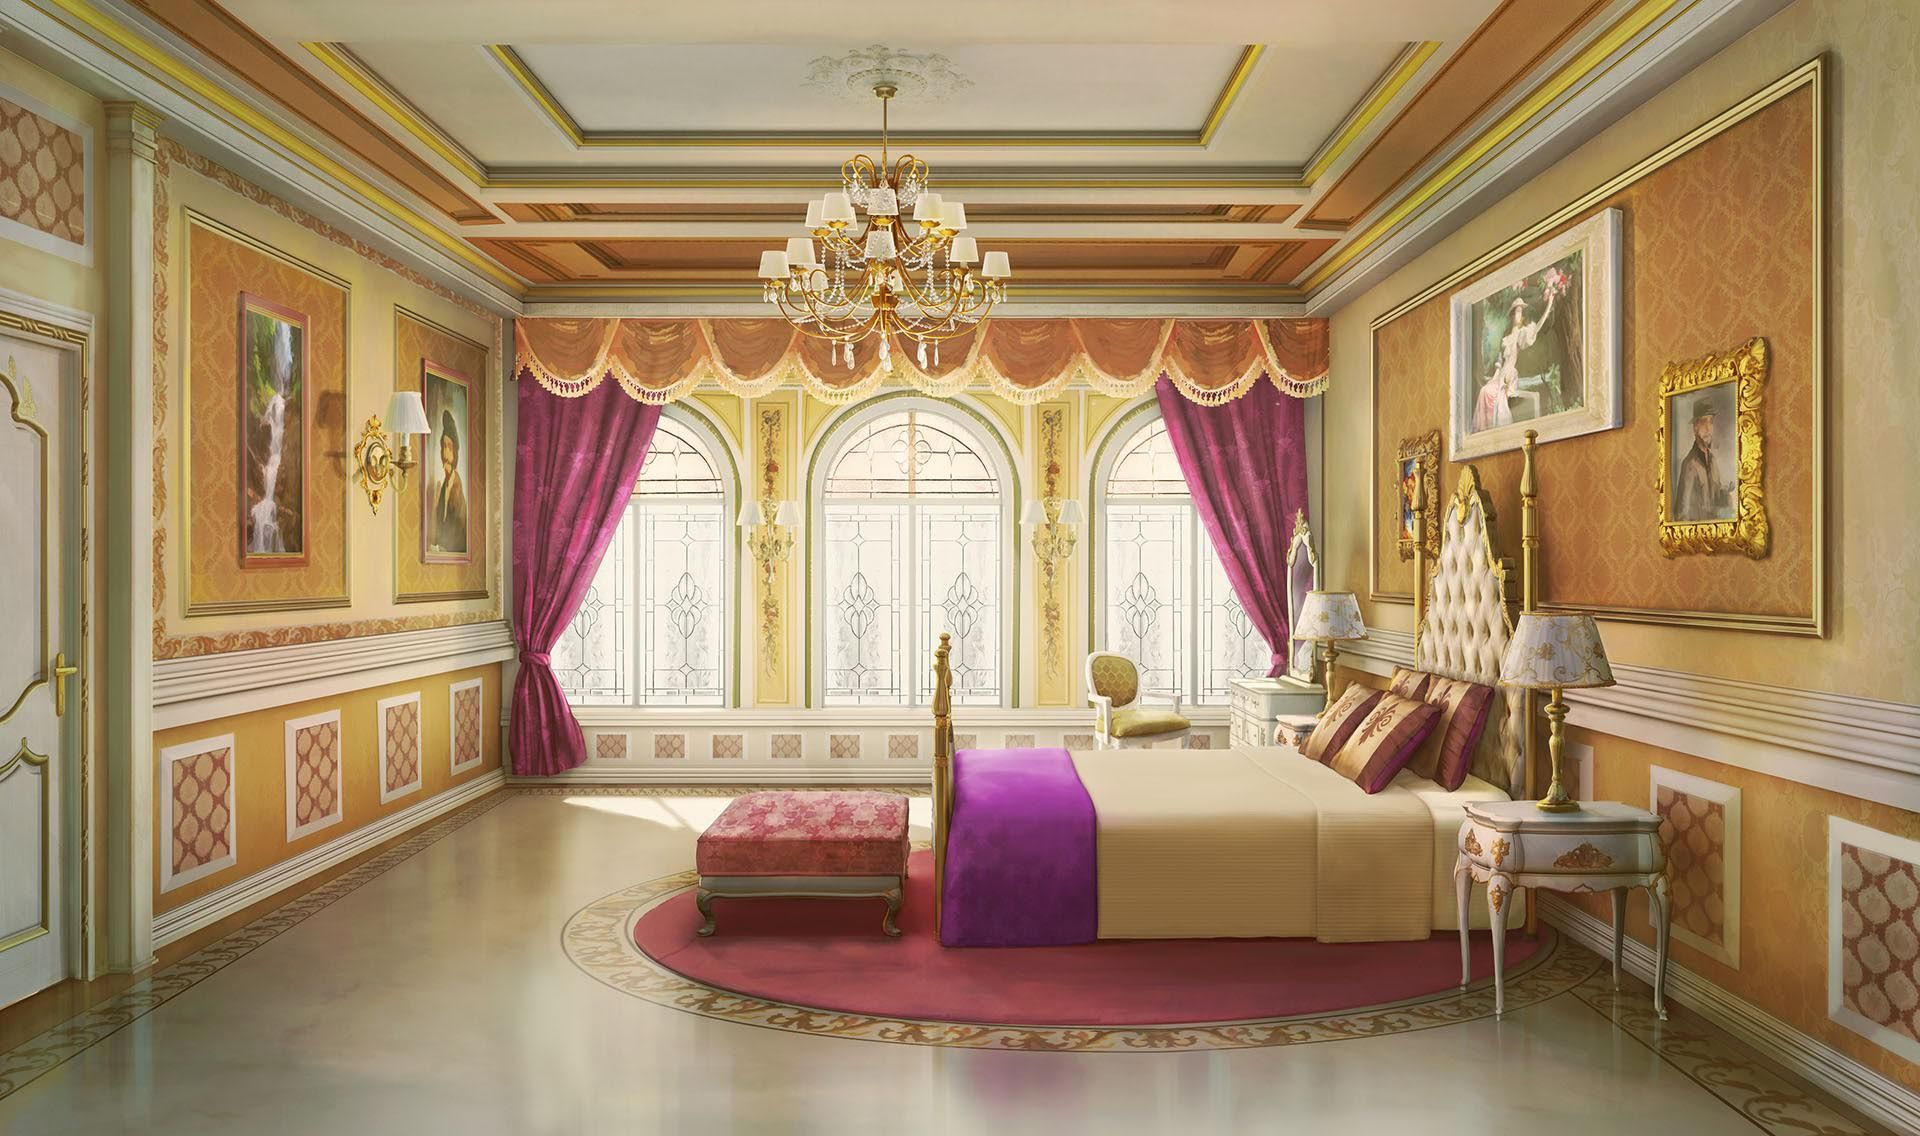 Pv4 Back Int Protag Royal Bedroom Day Jpg 1920 1136 Royal